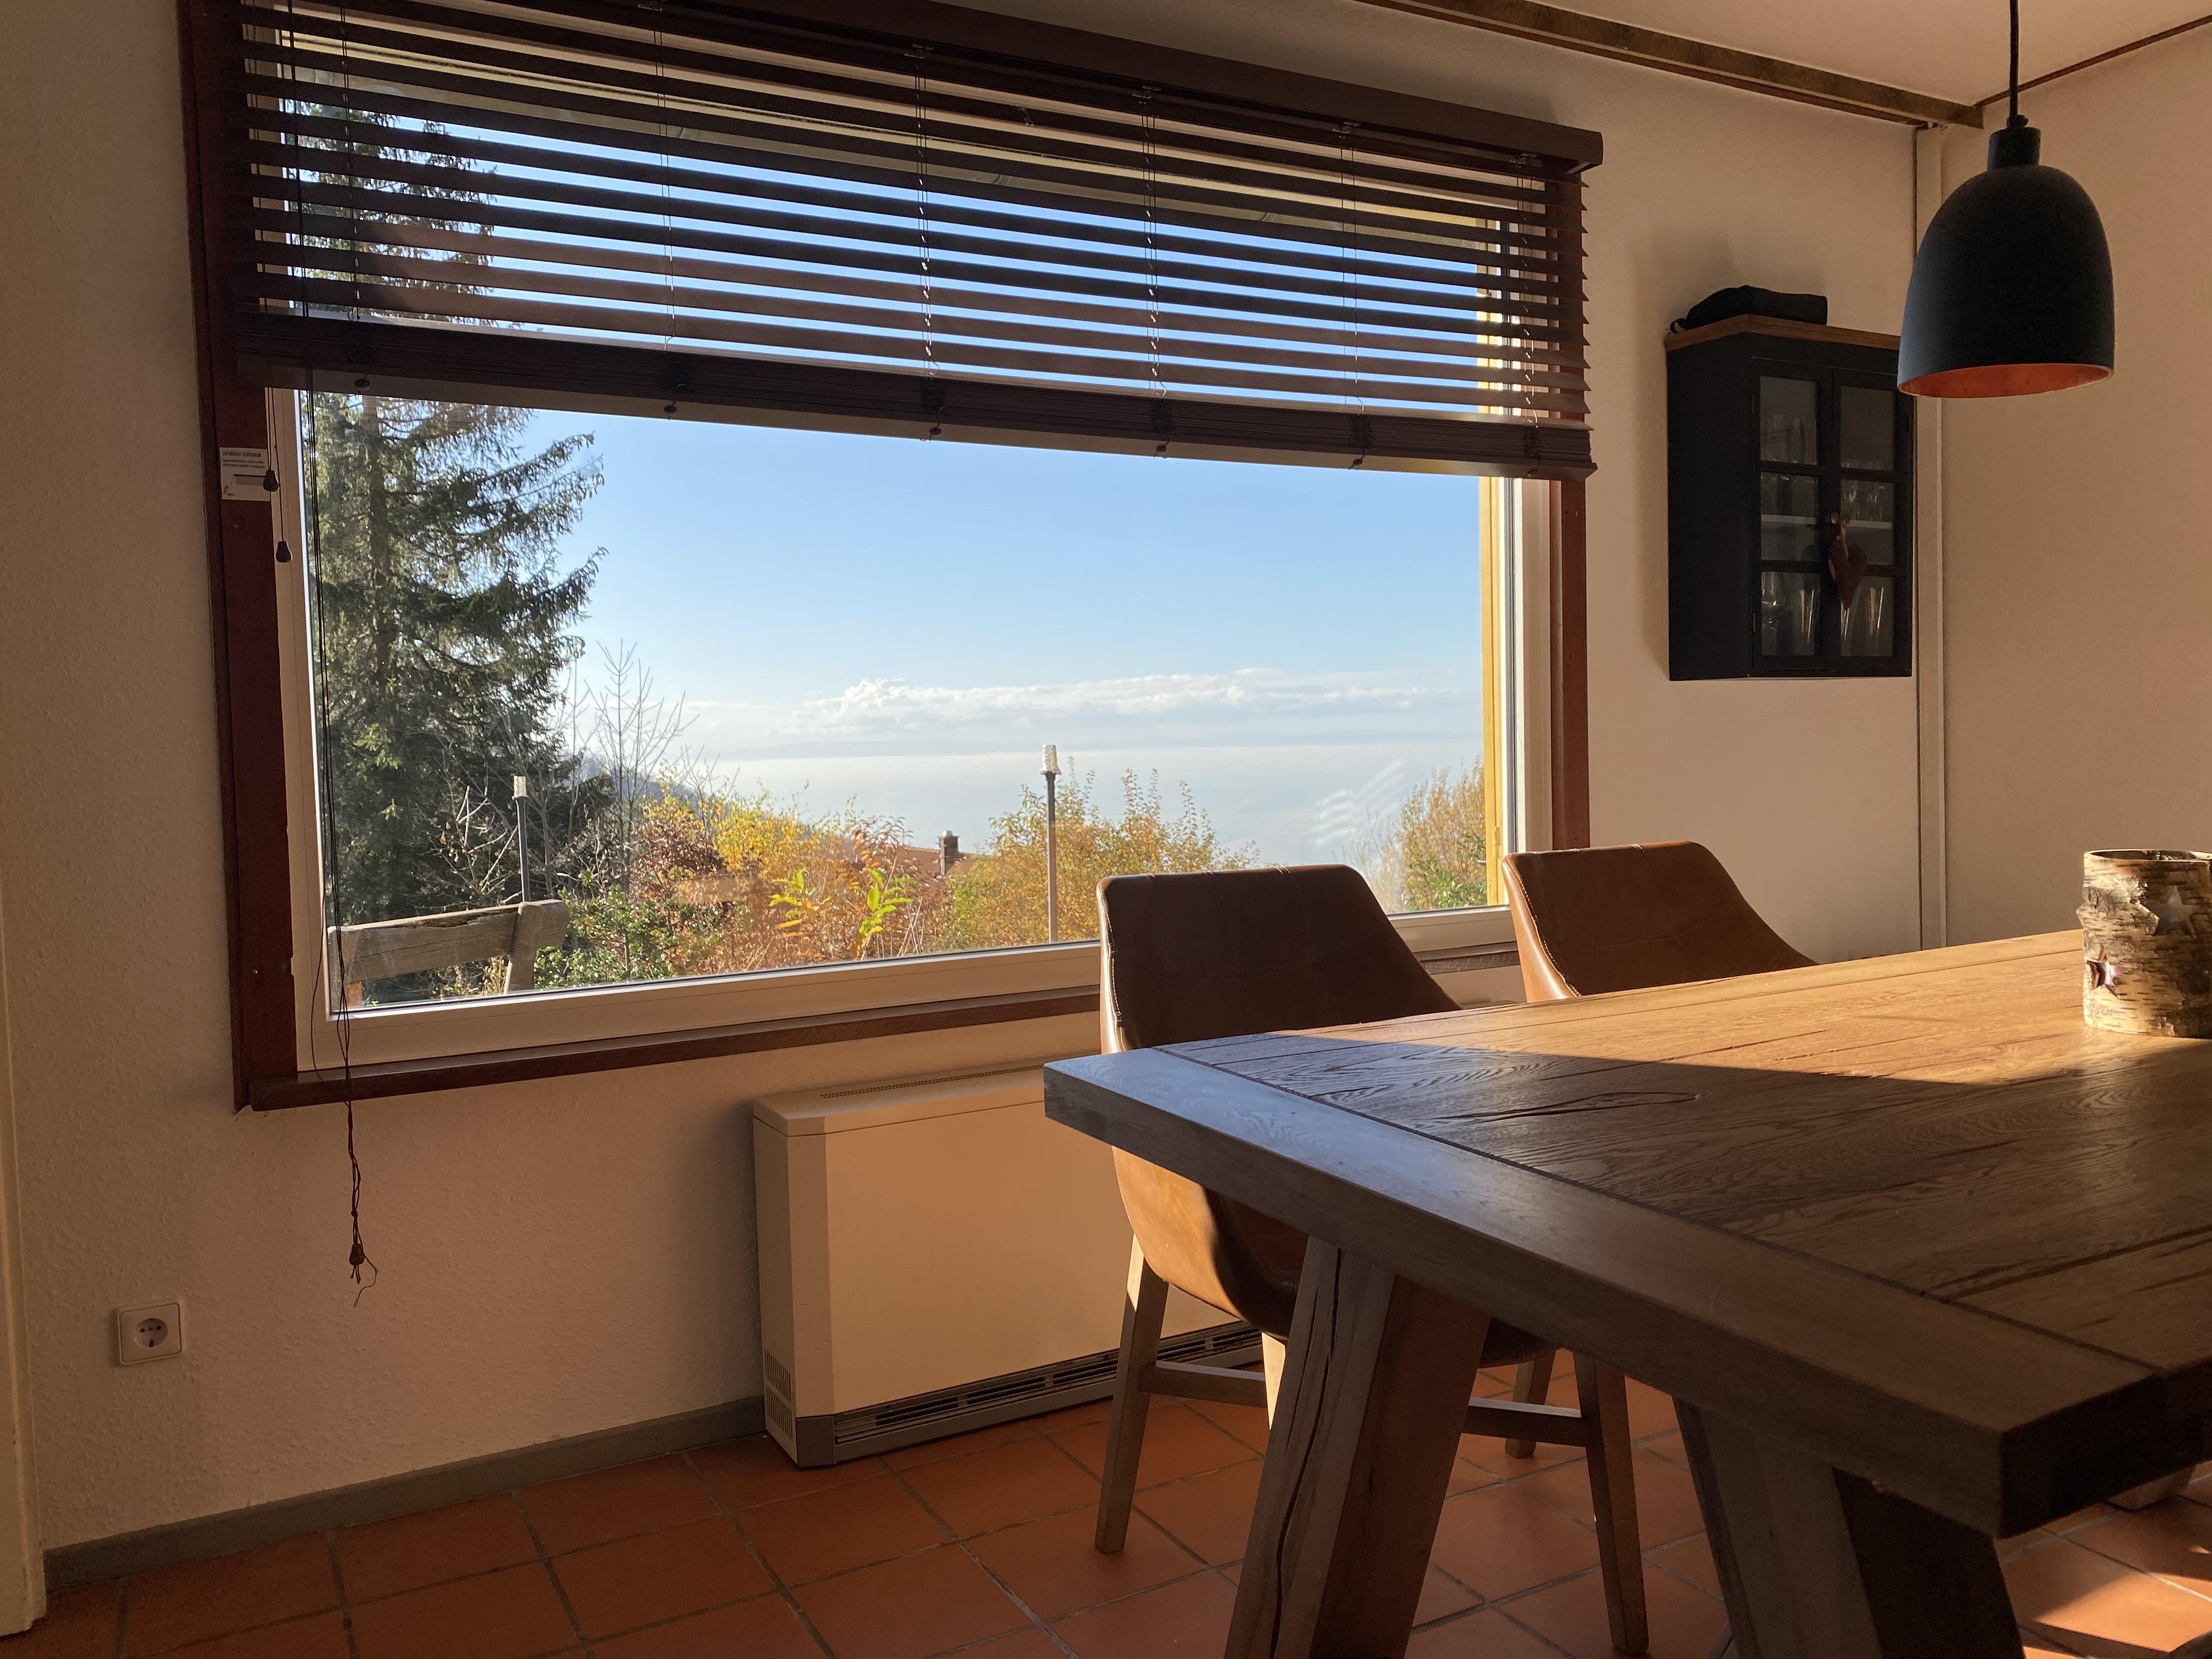 Panoramafenster - tagsüber